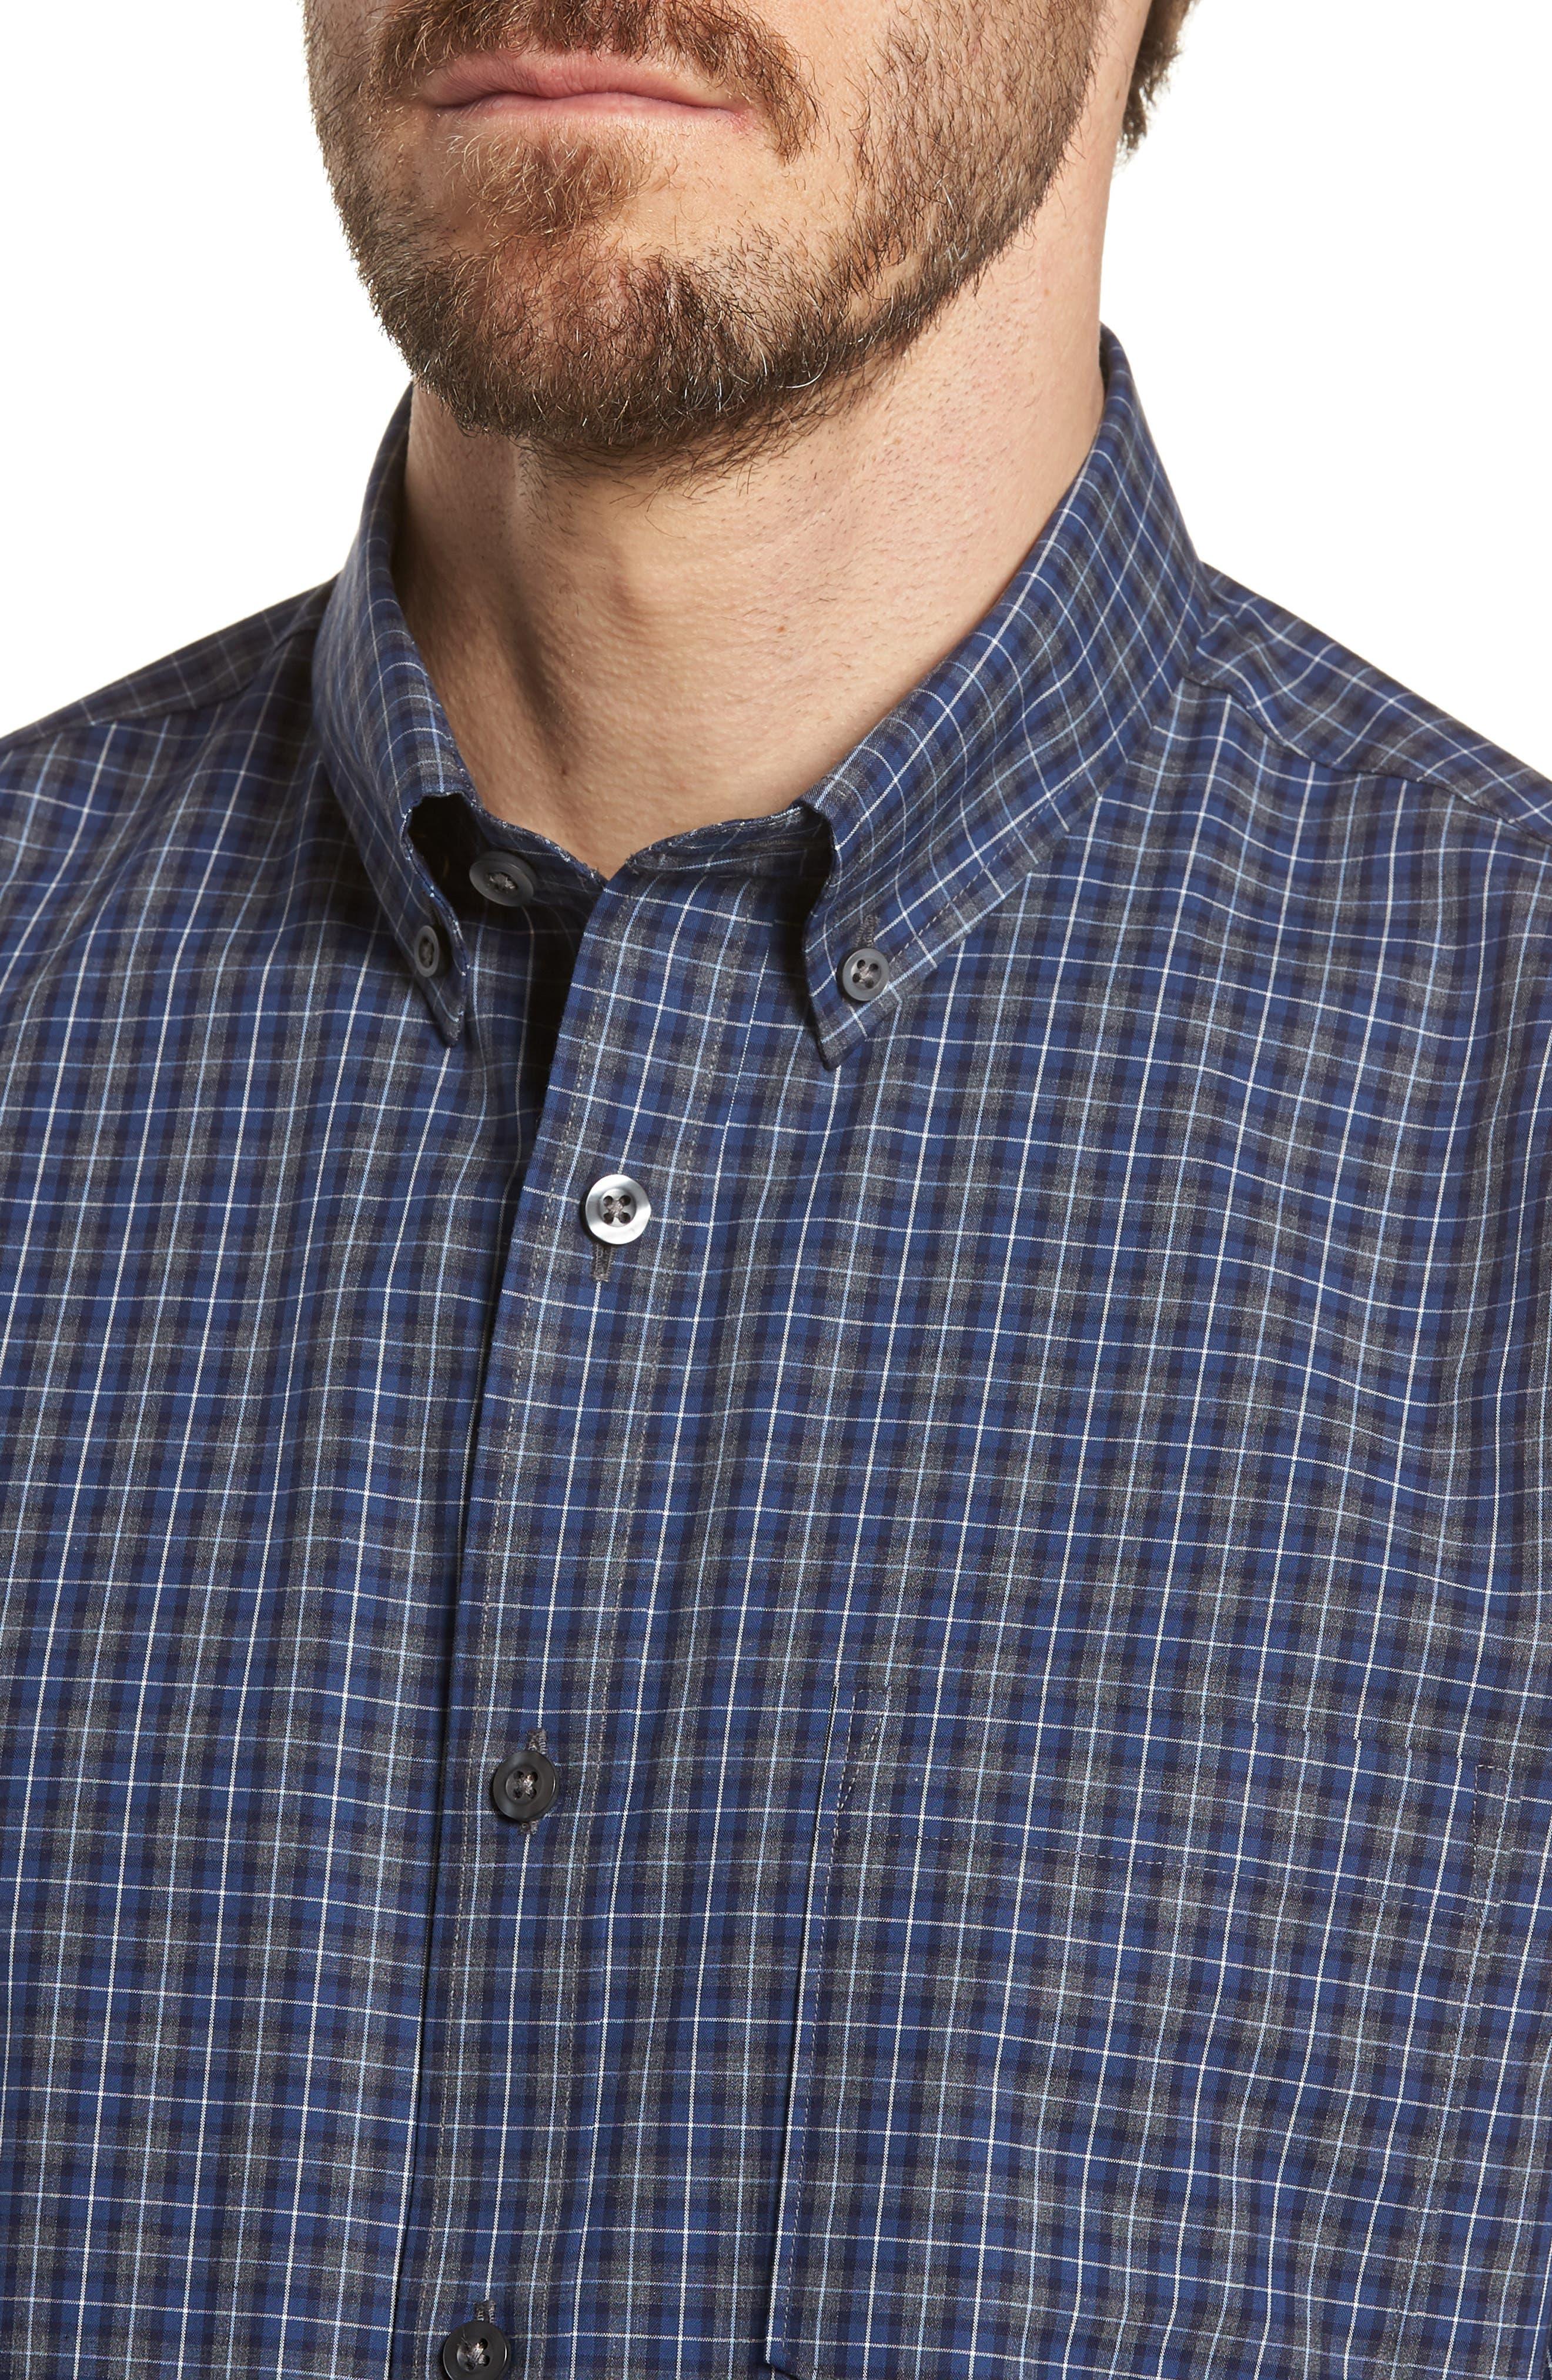 Trim Fit Check Sport Shirt,                             Alternate thumbnail 2, color,                             Navy Peacoat Grey Check